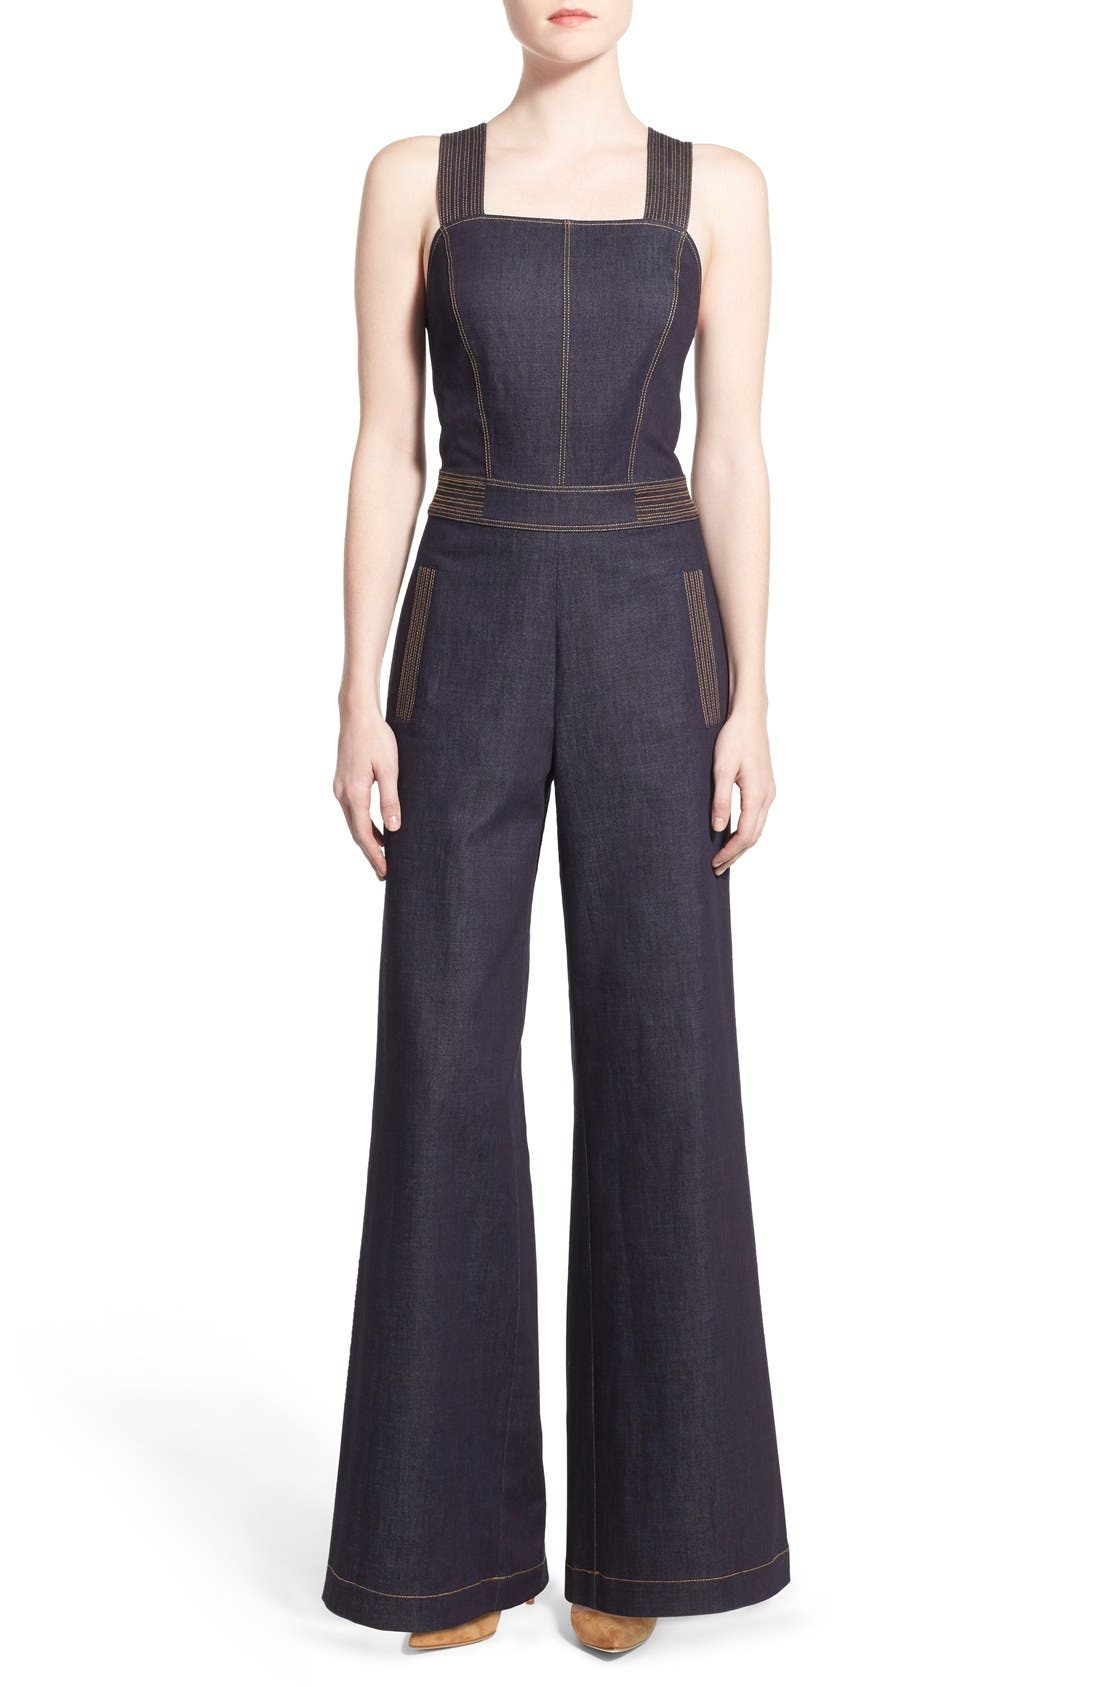 Alternate Image 1 Selected - Olivia Palermo + Chelsea28 Wide Leg Denim Jumpsuit